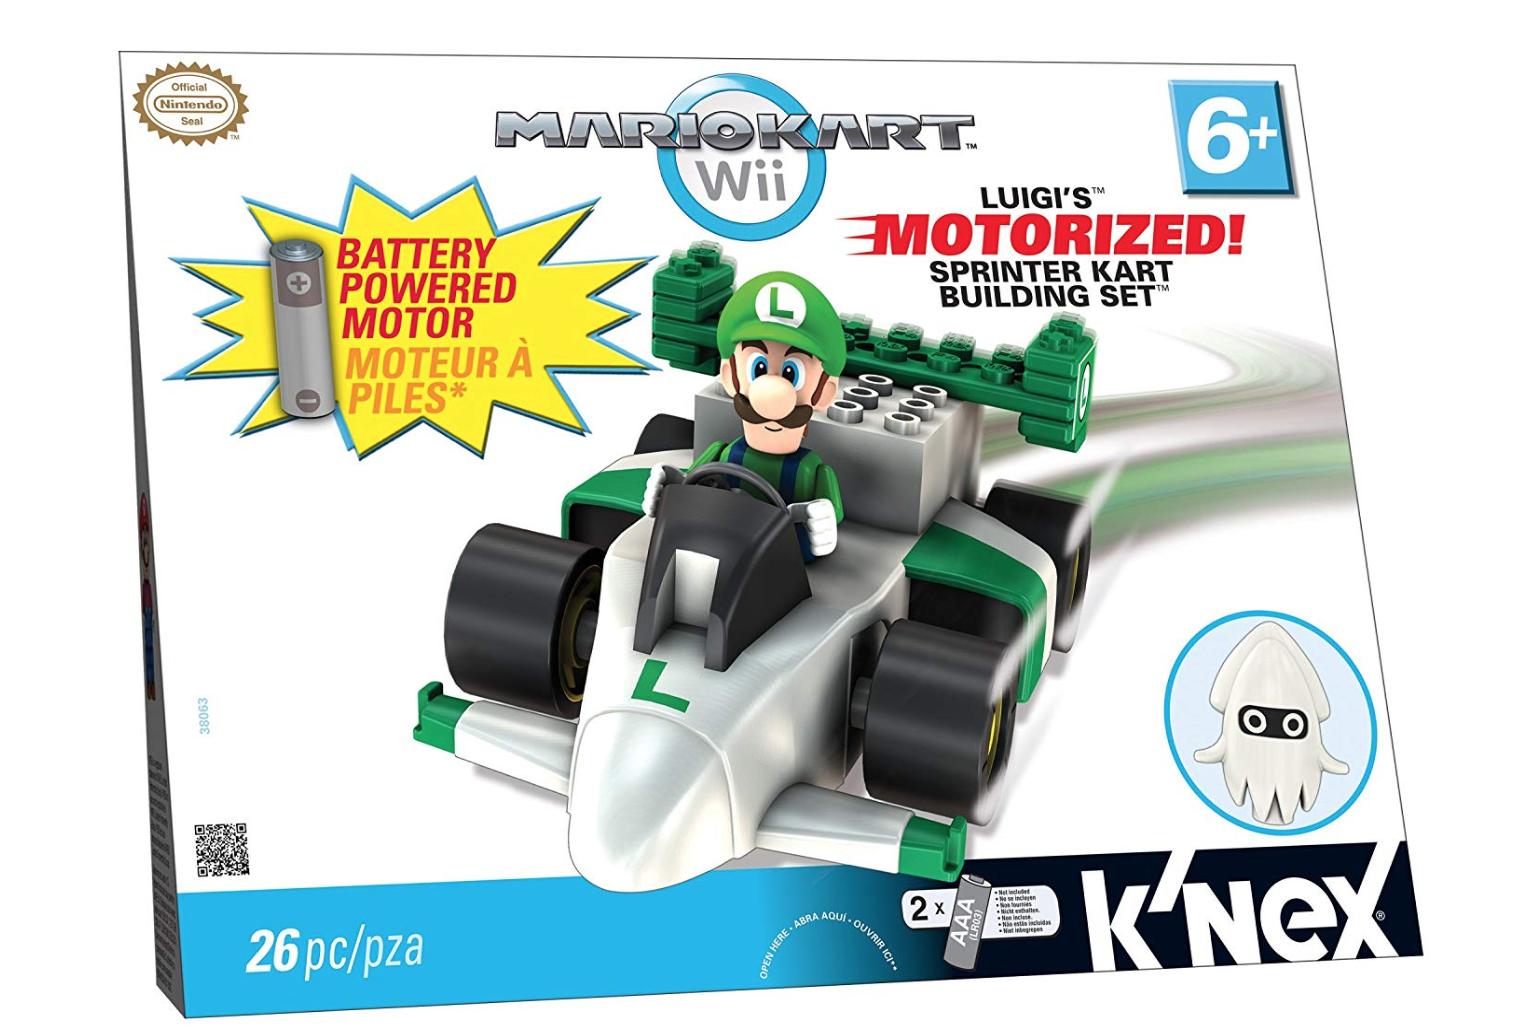 K'NEX Mario Kart Wii Building Set  Luigi's Motorized Sprinter Kart